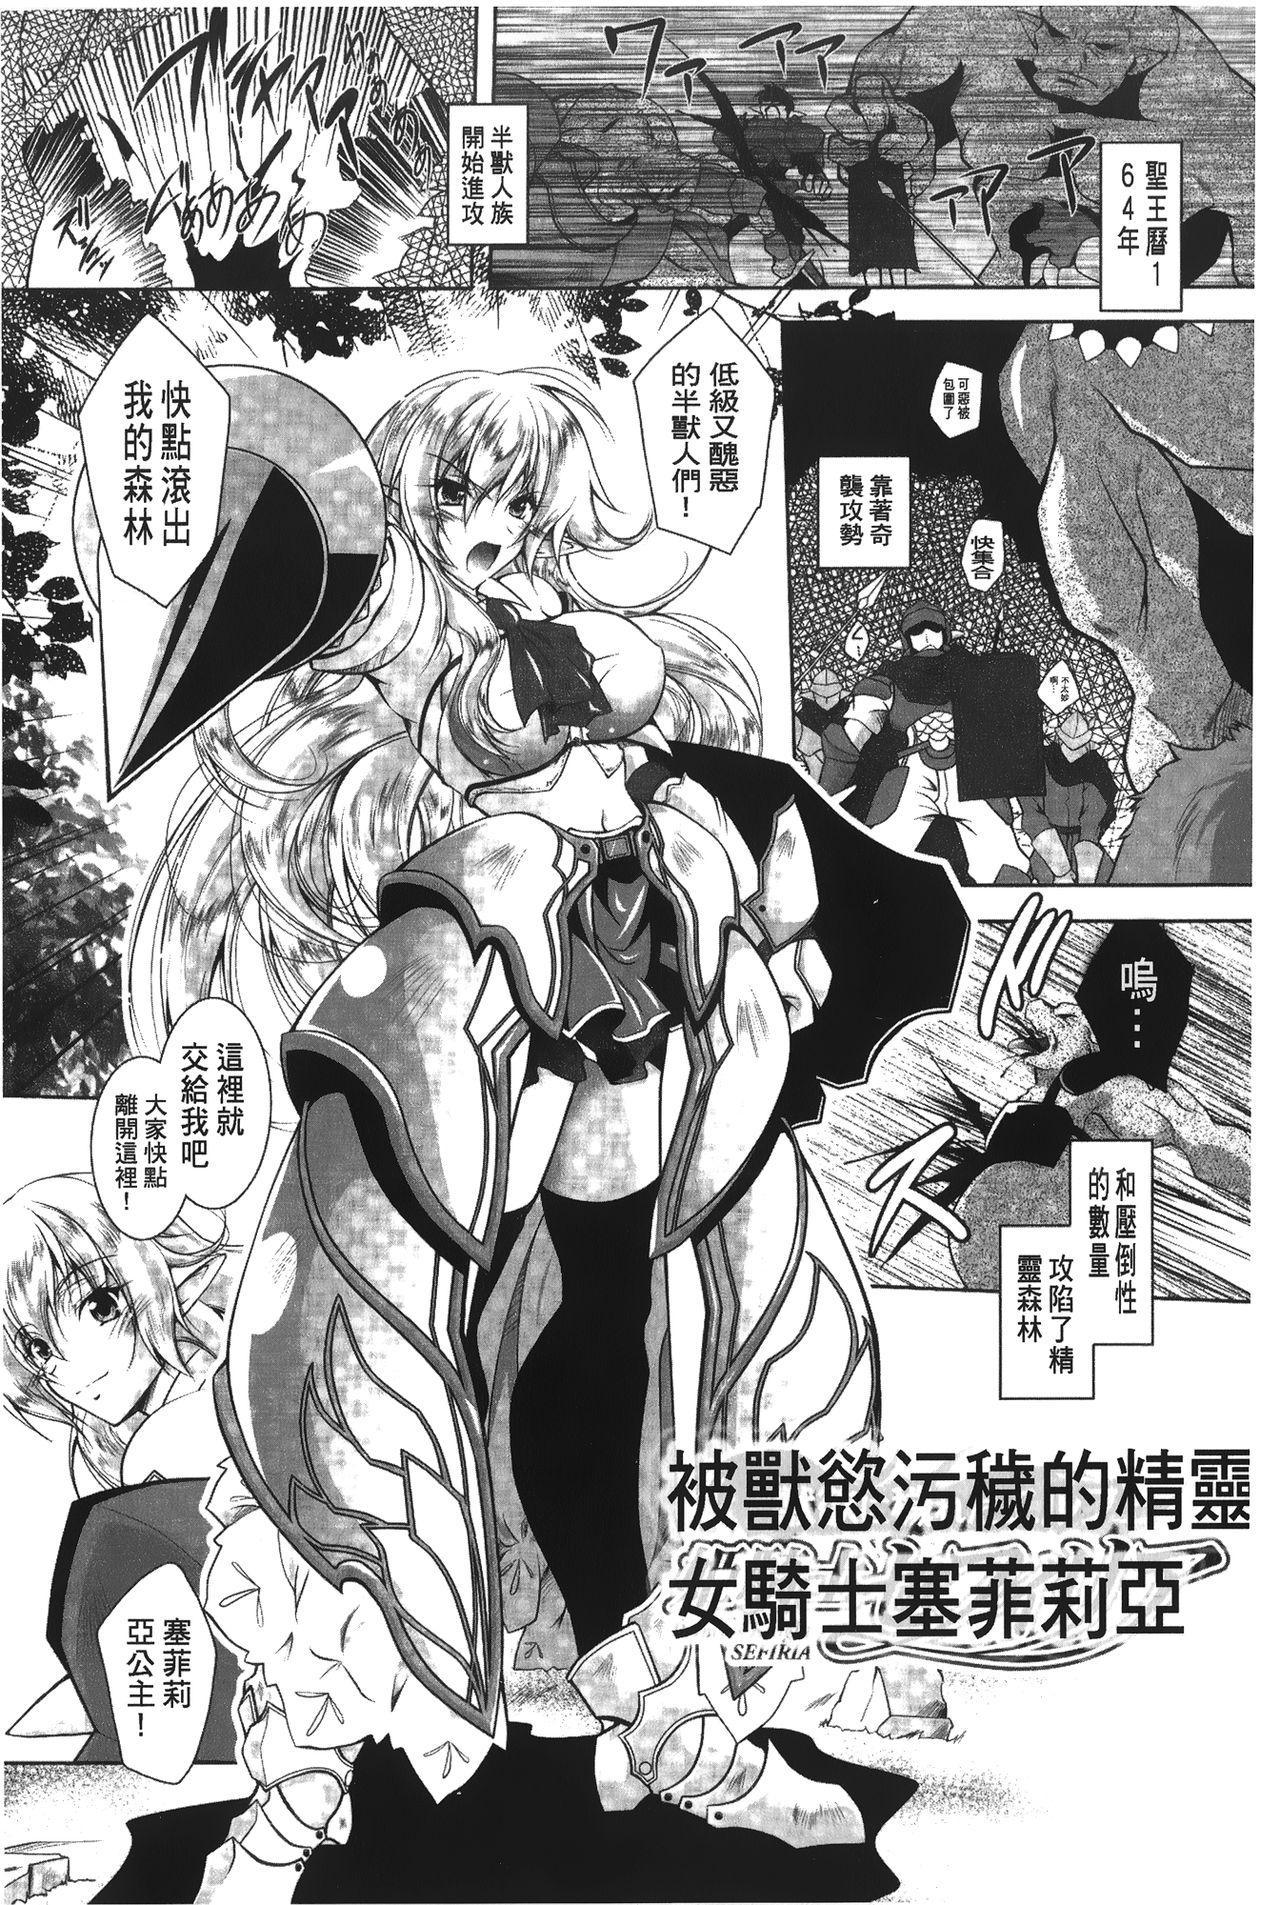 [Parfait] Datenshi-tachi no Rondo - Fallen Angels Rondo   墮天使們的圓舞曲 [Chinese] 23